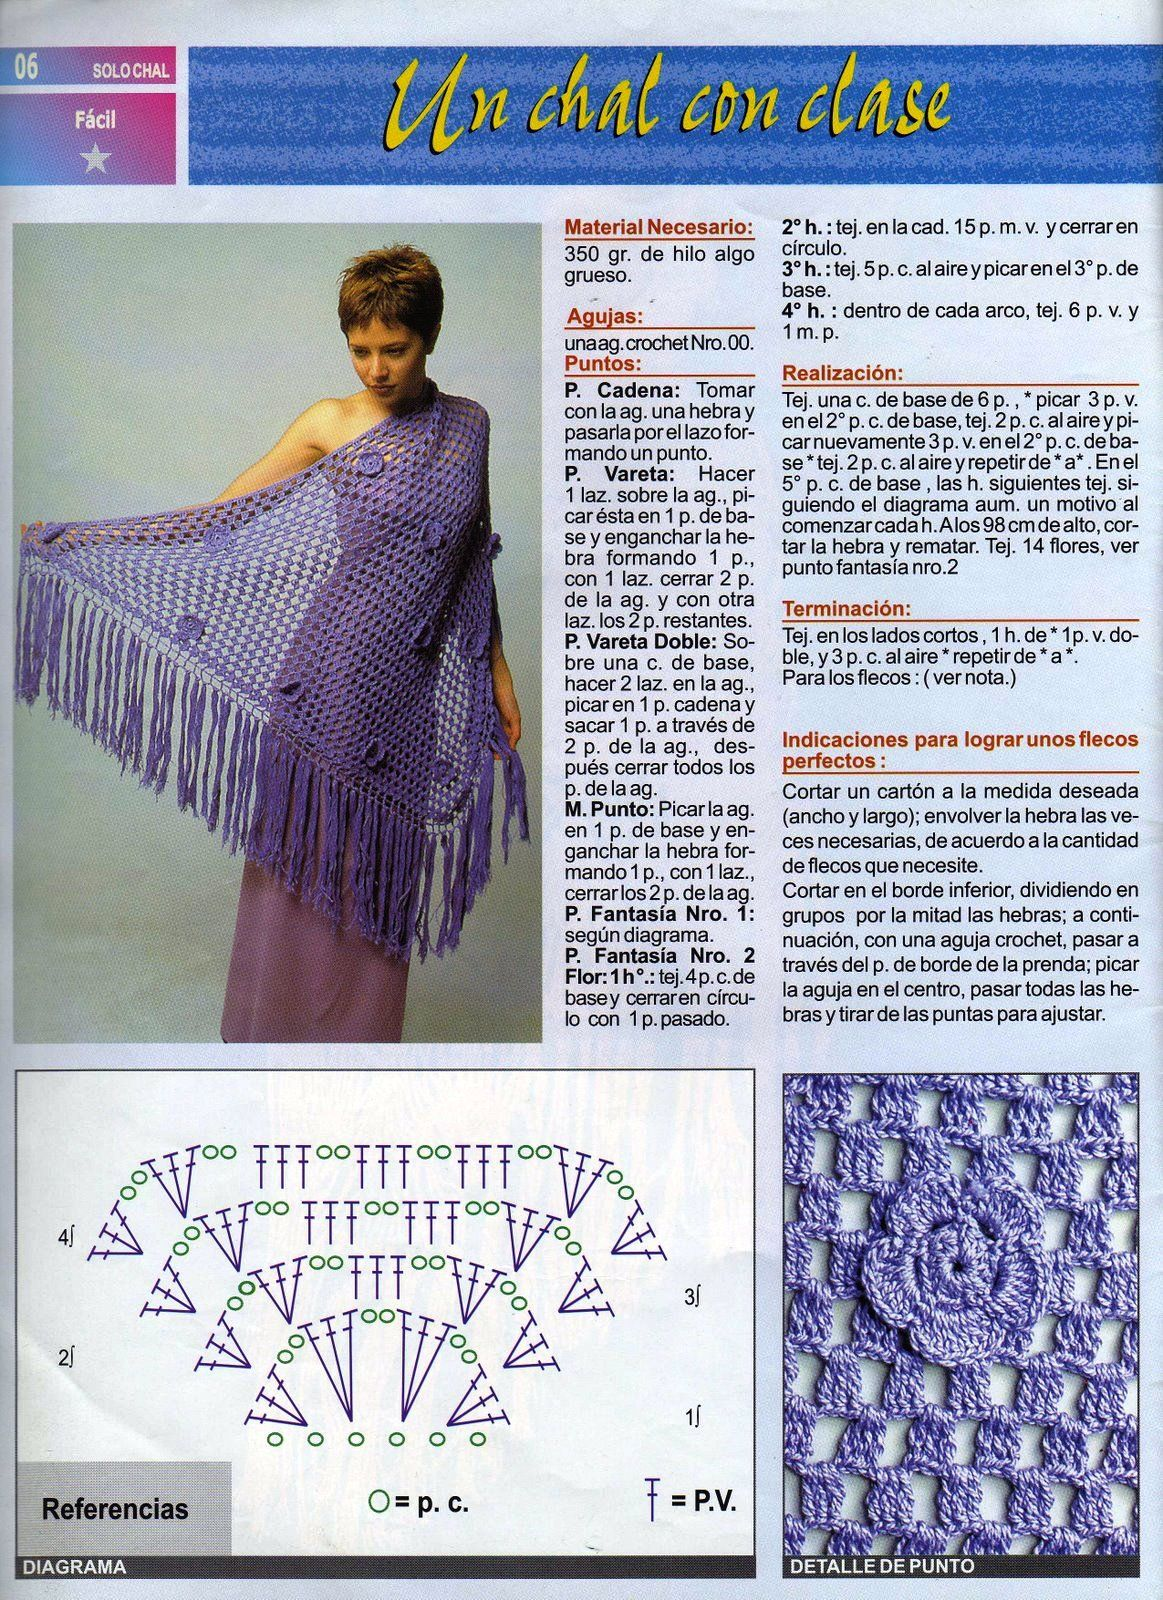 Patrones de Crochet. Chal | blusas crochet | Pinterest | Patrones de ...